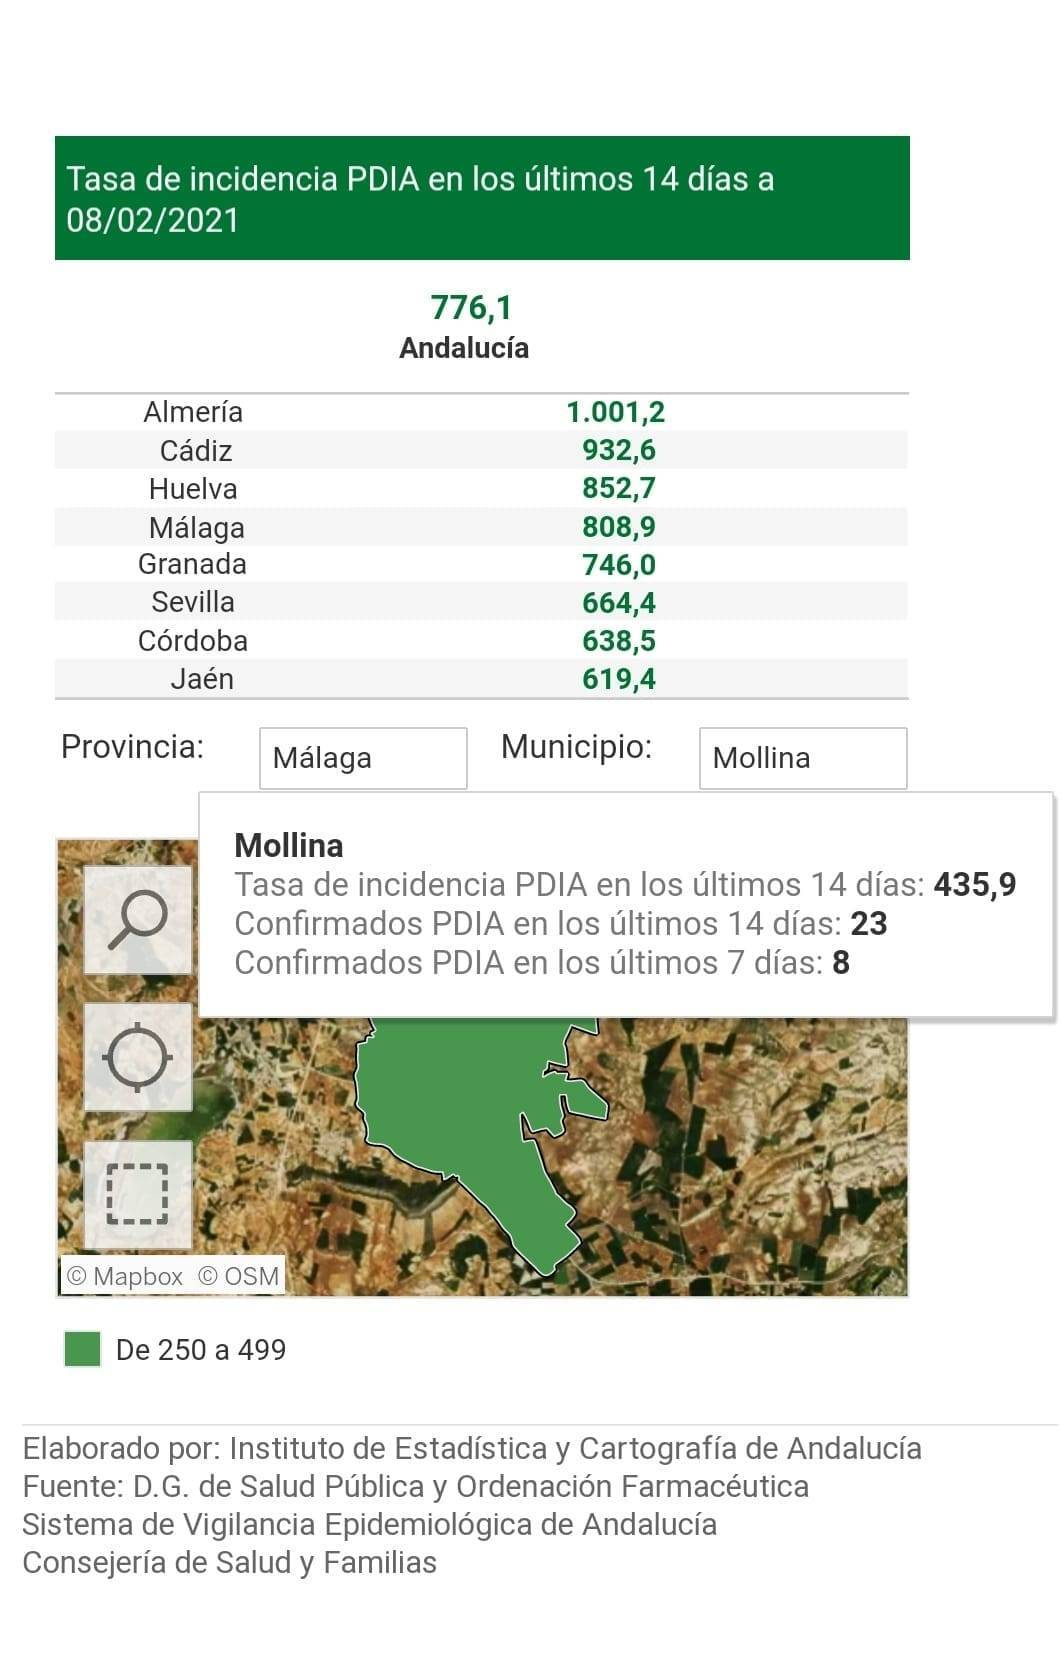 23 casos positivos activos de COVID-19 (febrero 2021) - Mollina (Málaga)